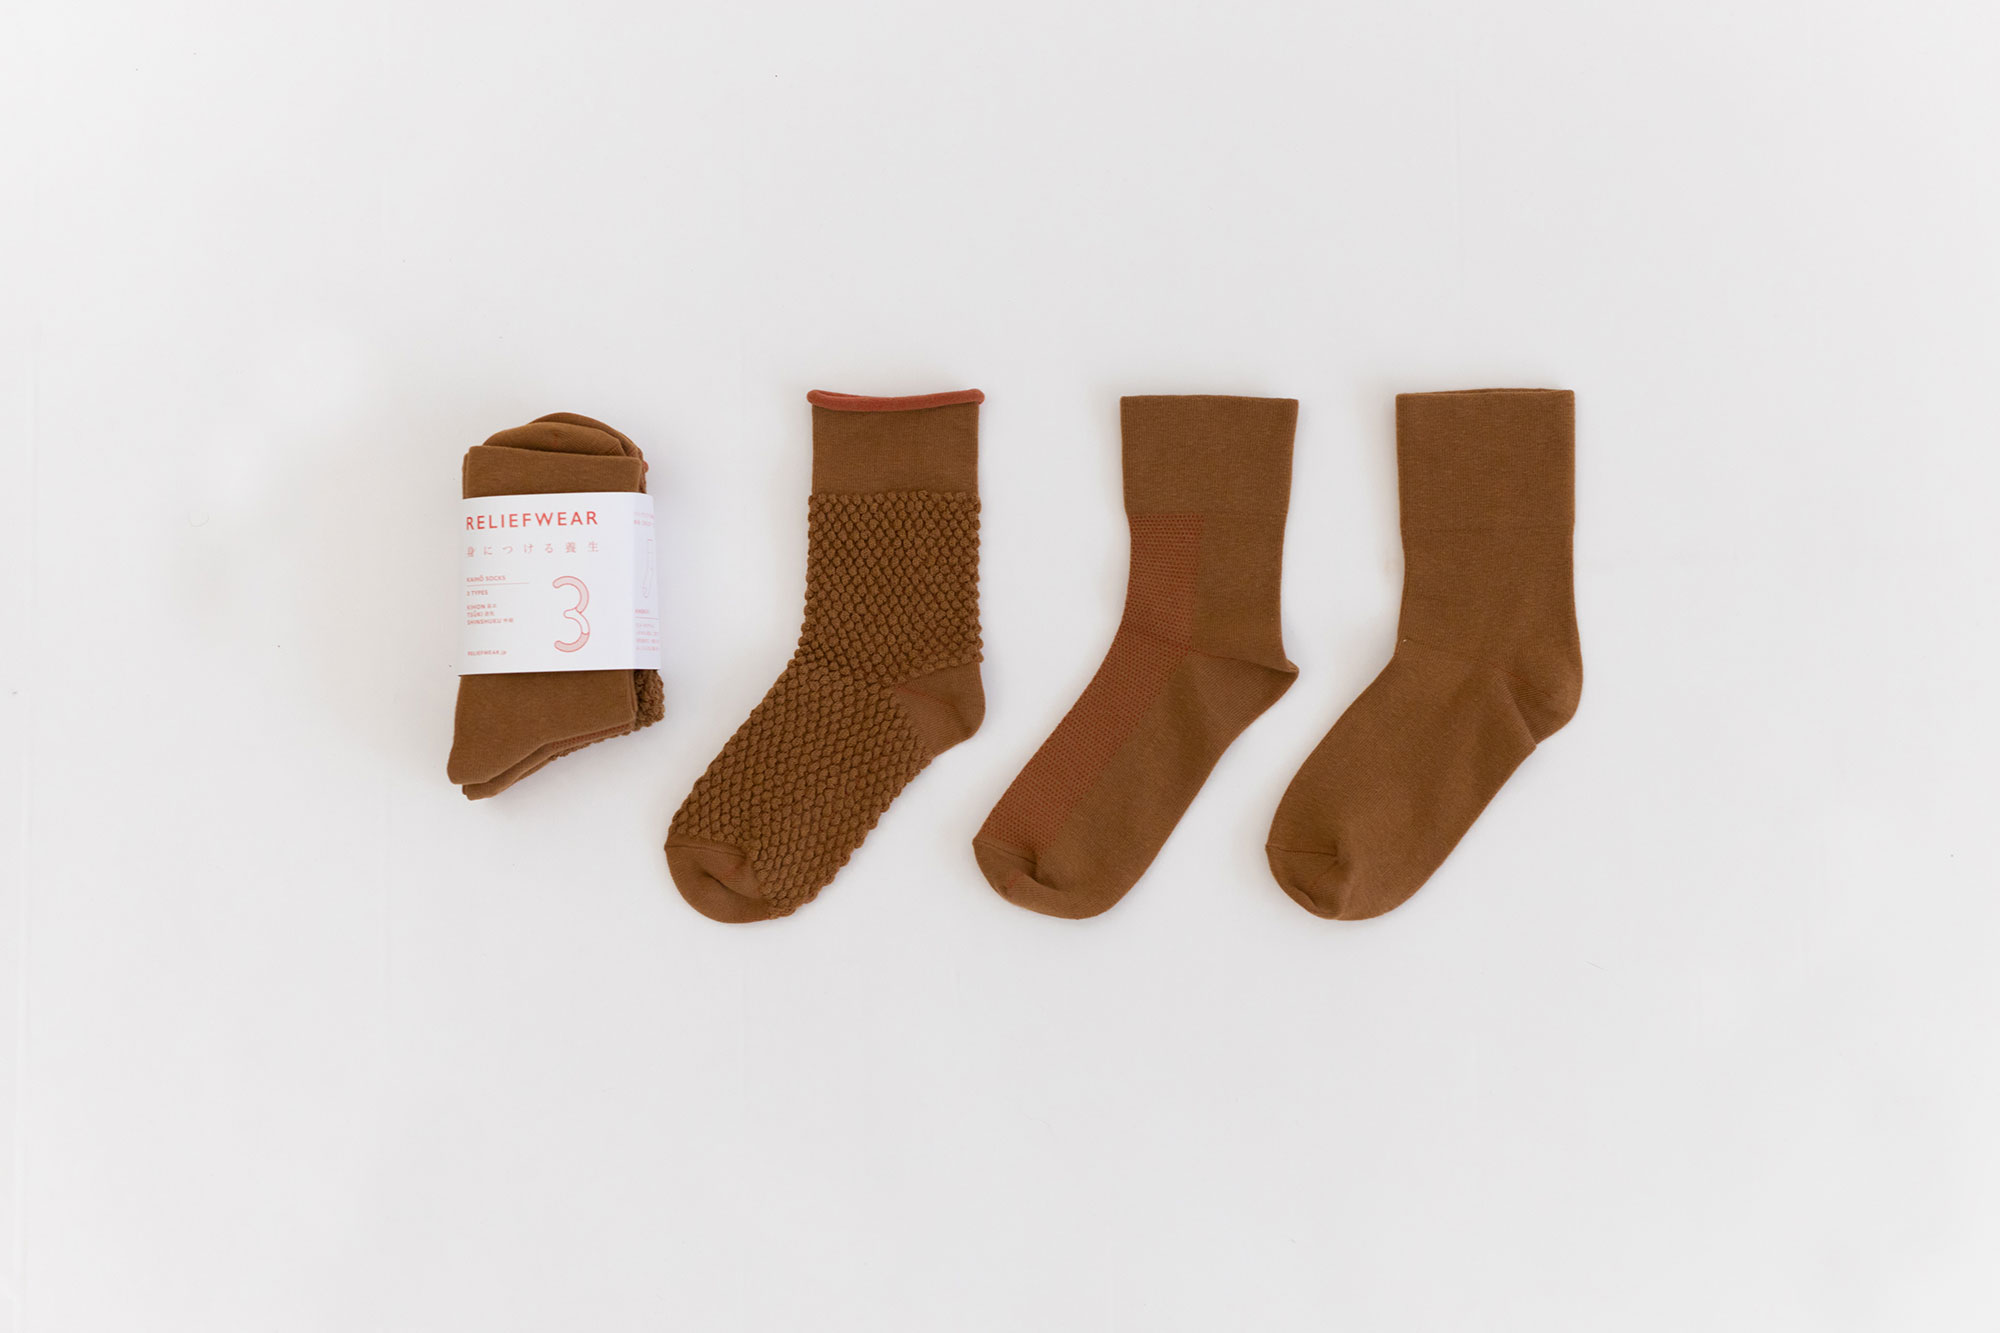 RELIEFWEAR KAIHŌ SOCKS 3 TYPE SET